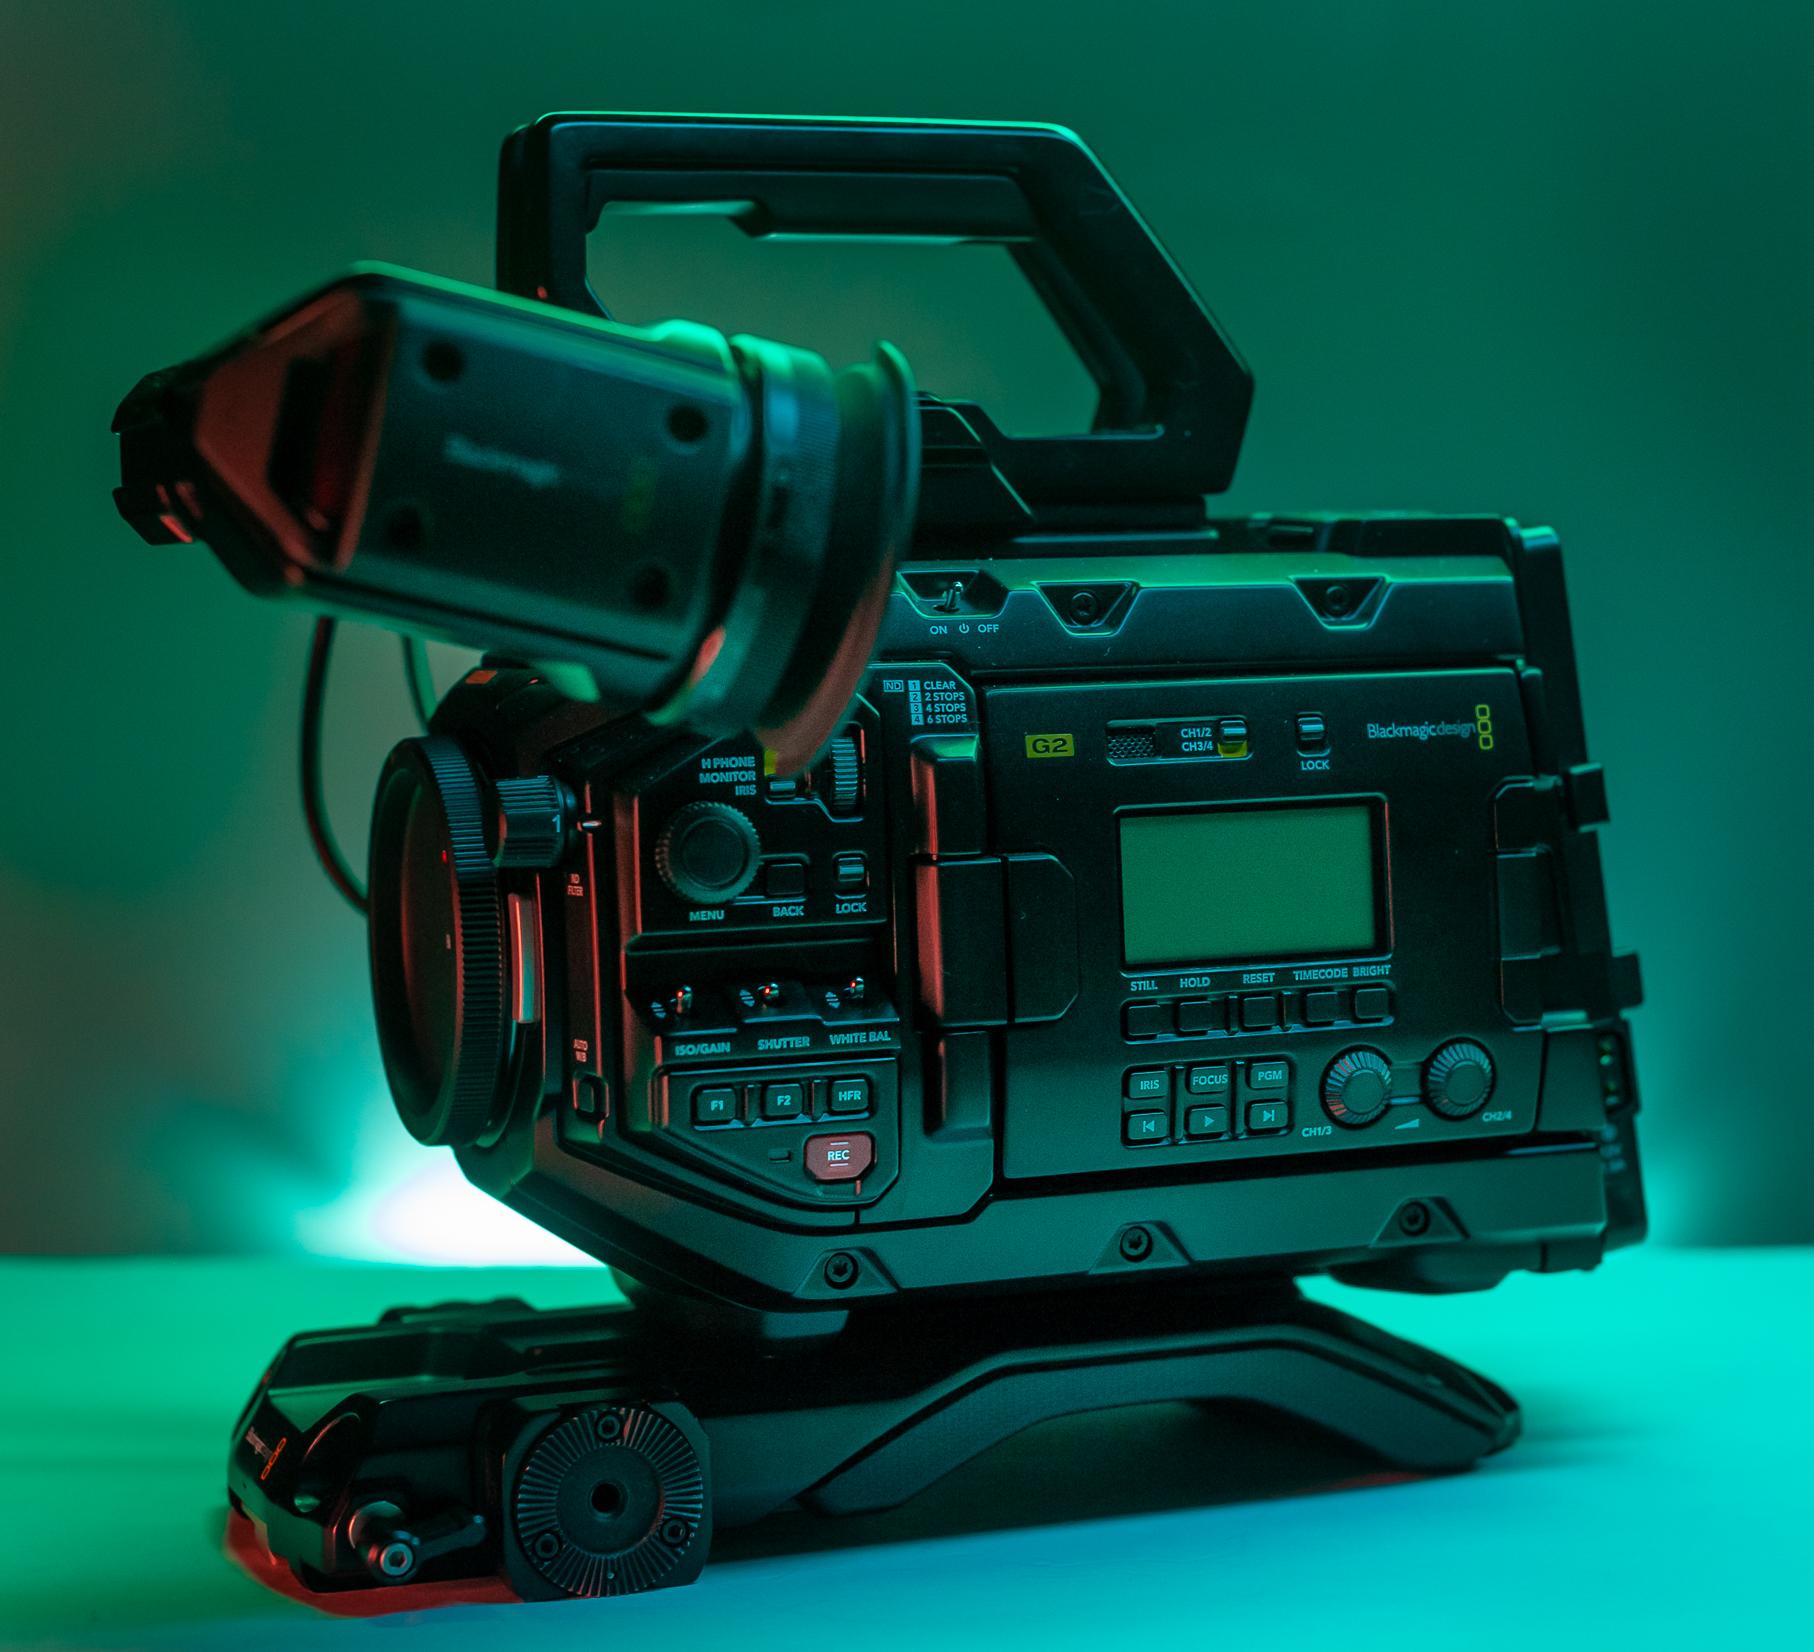 The Review of The Blackmagic Design URSA Mini Pro G2 2